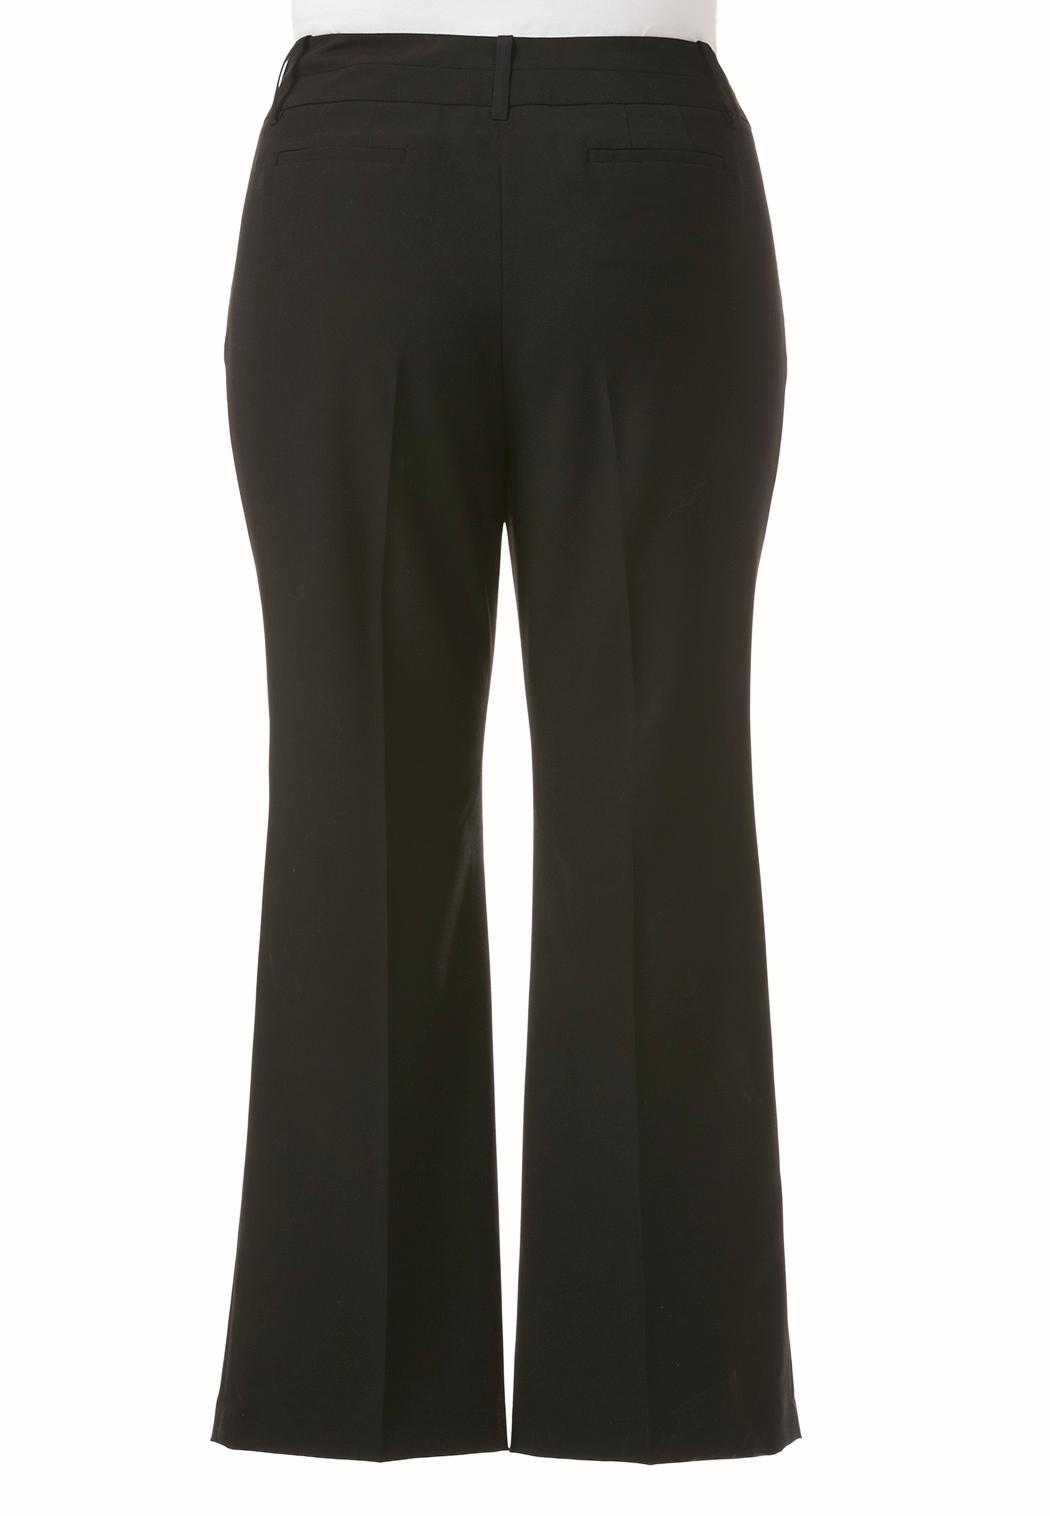 Plus Petite Curvy Shape Enhancing Trousers (Item #37635737)